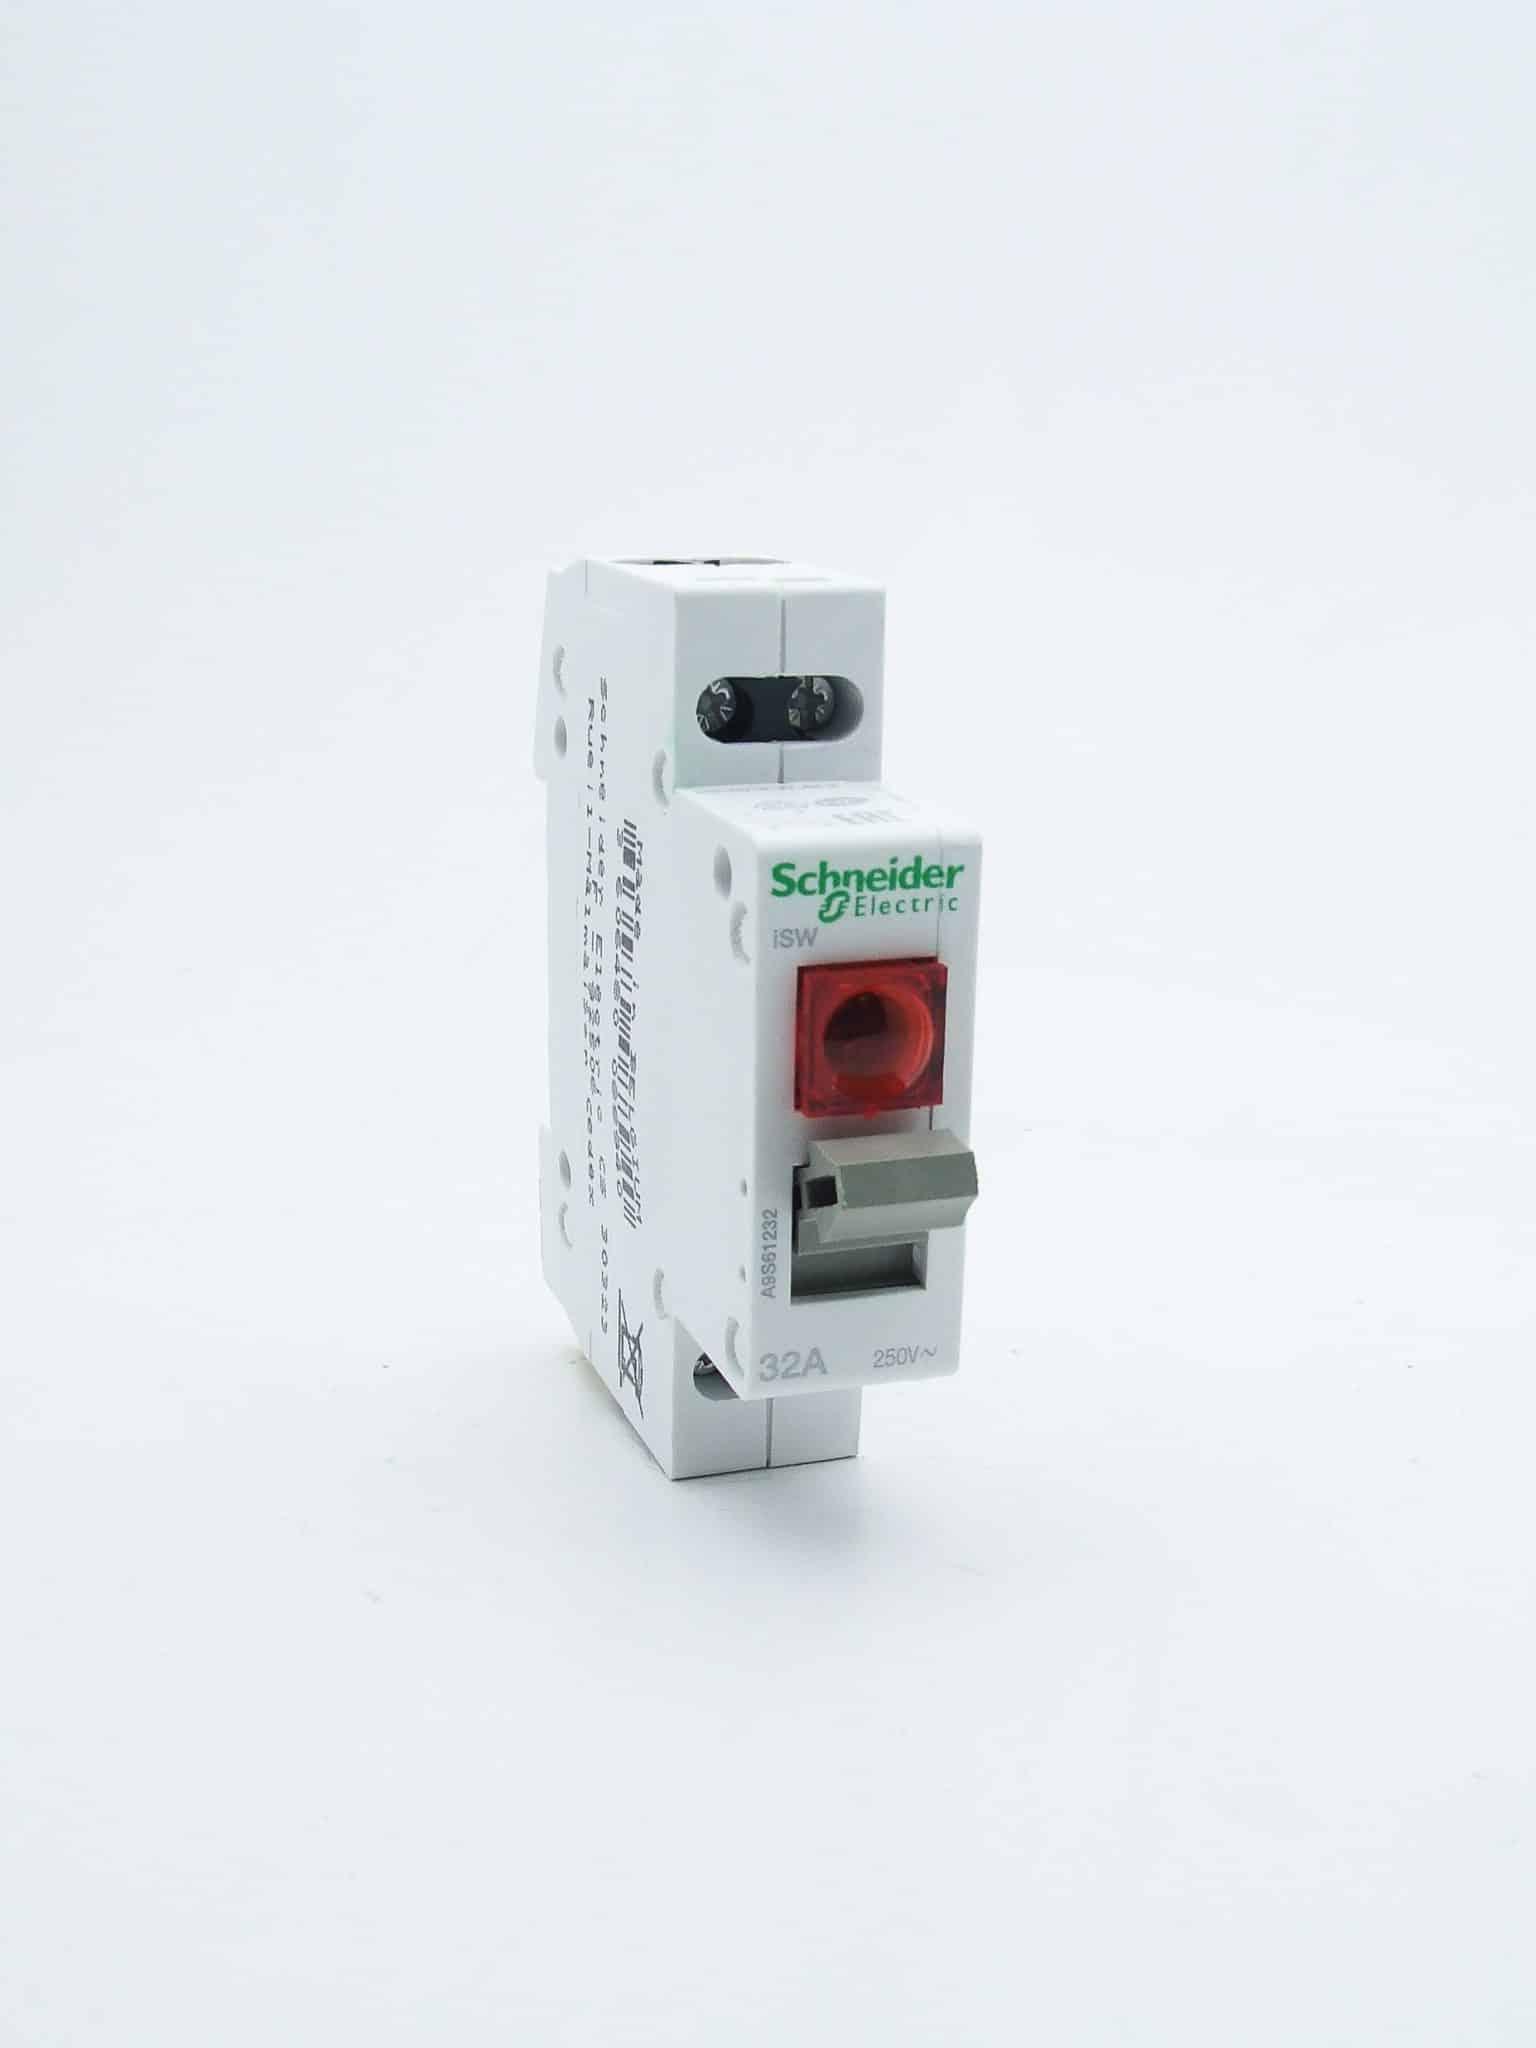 Acti9 iSW interrupteur de commande 1P 20A 250VCA.A9S60120